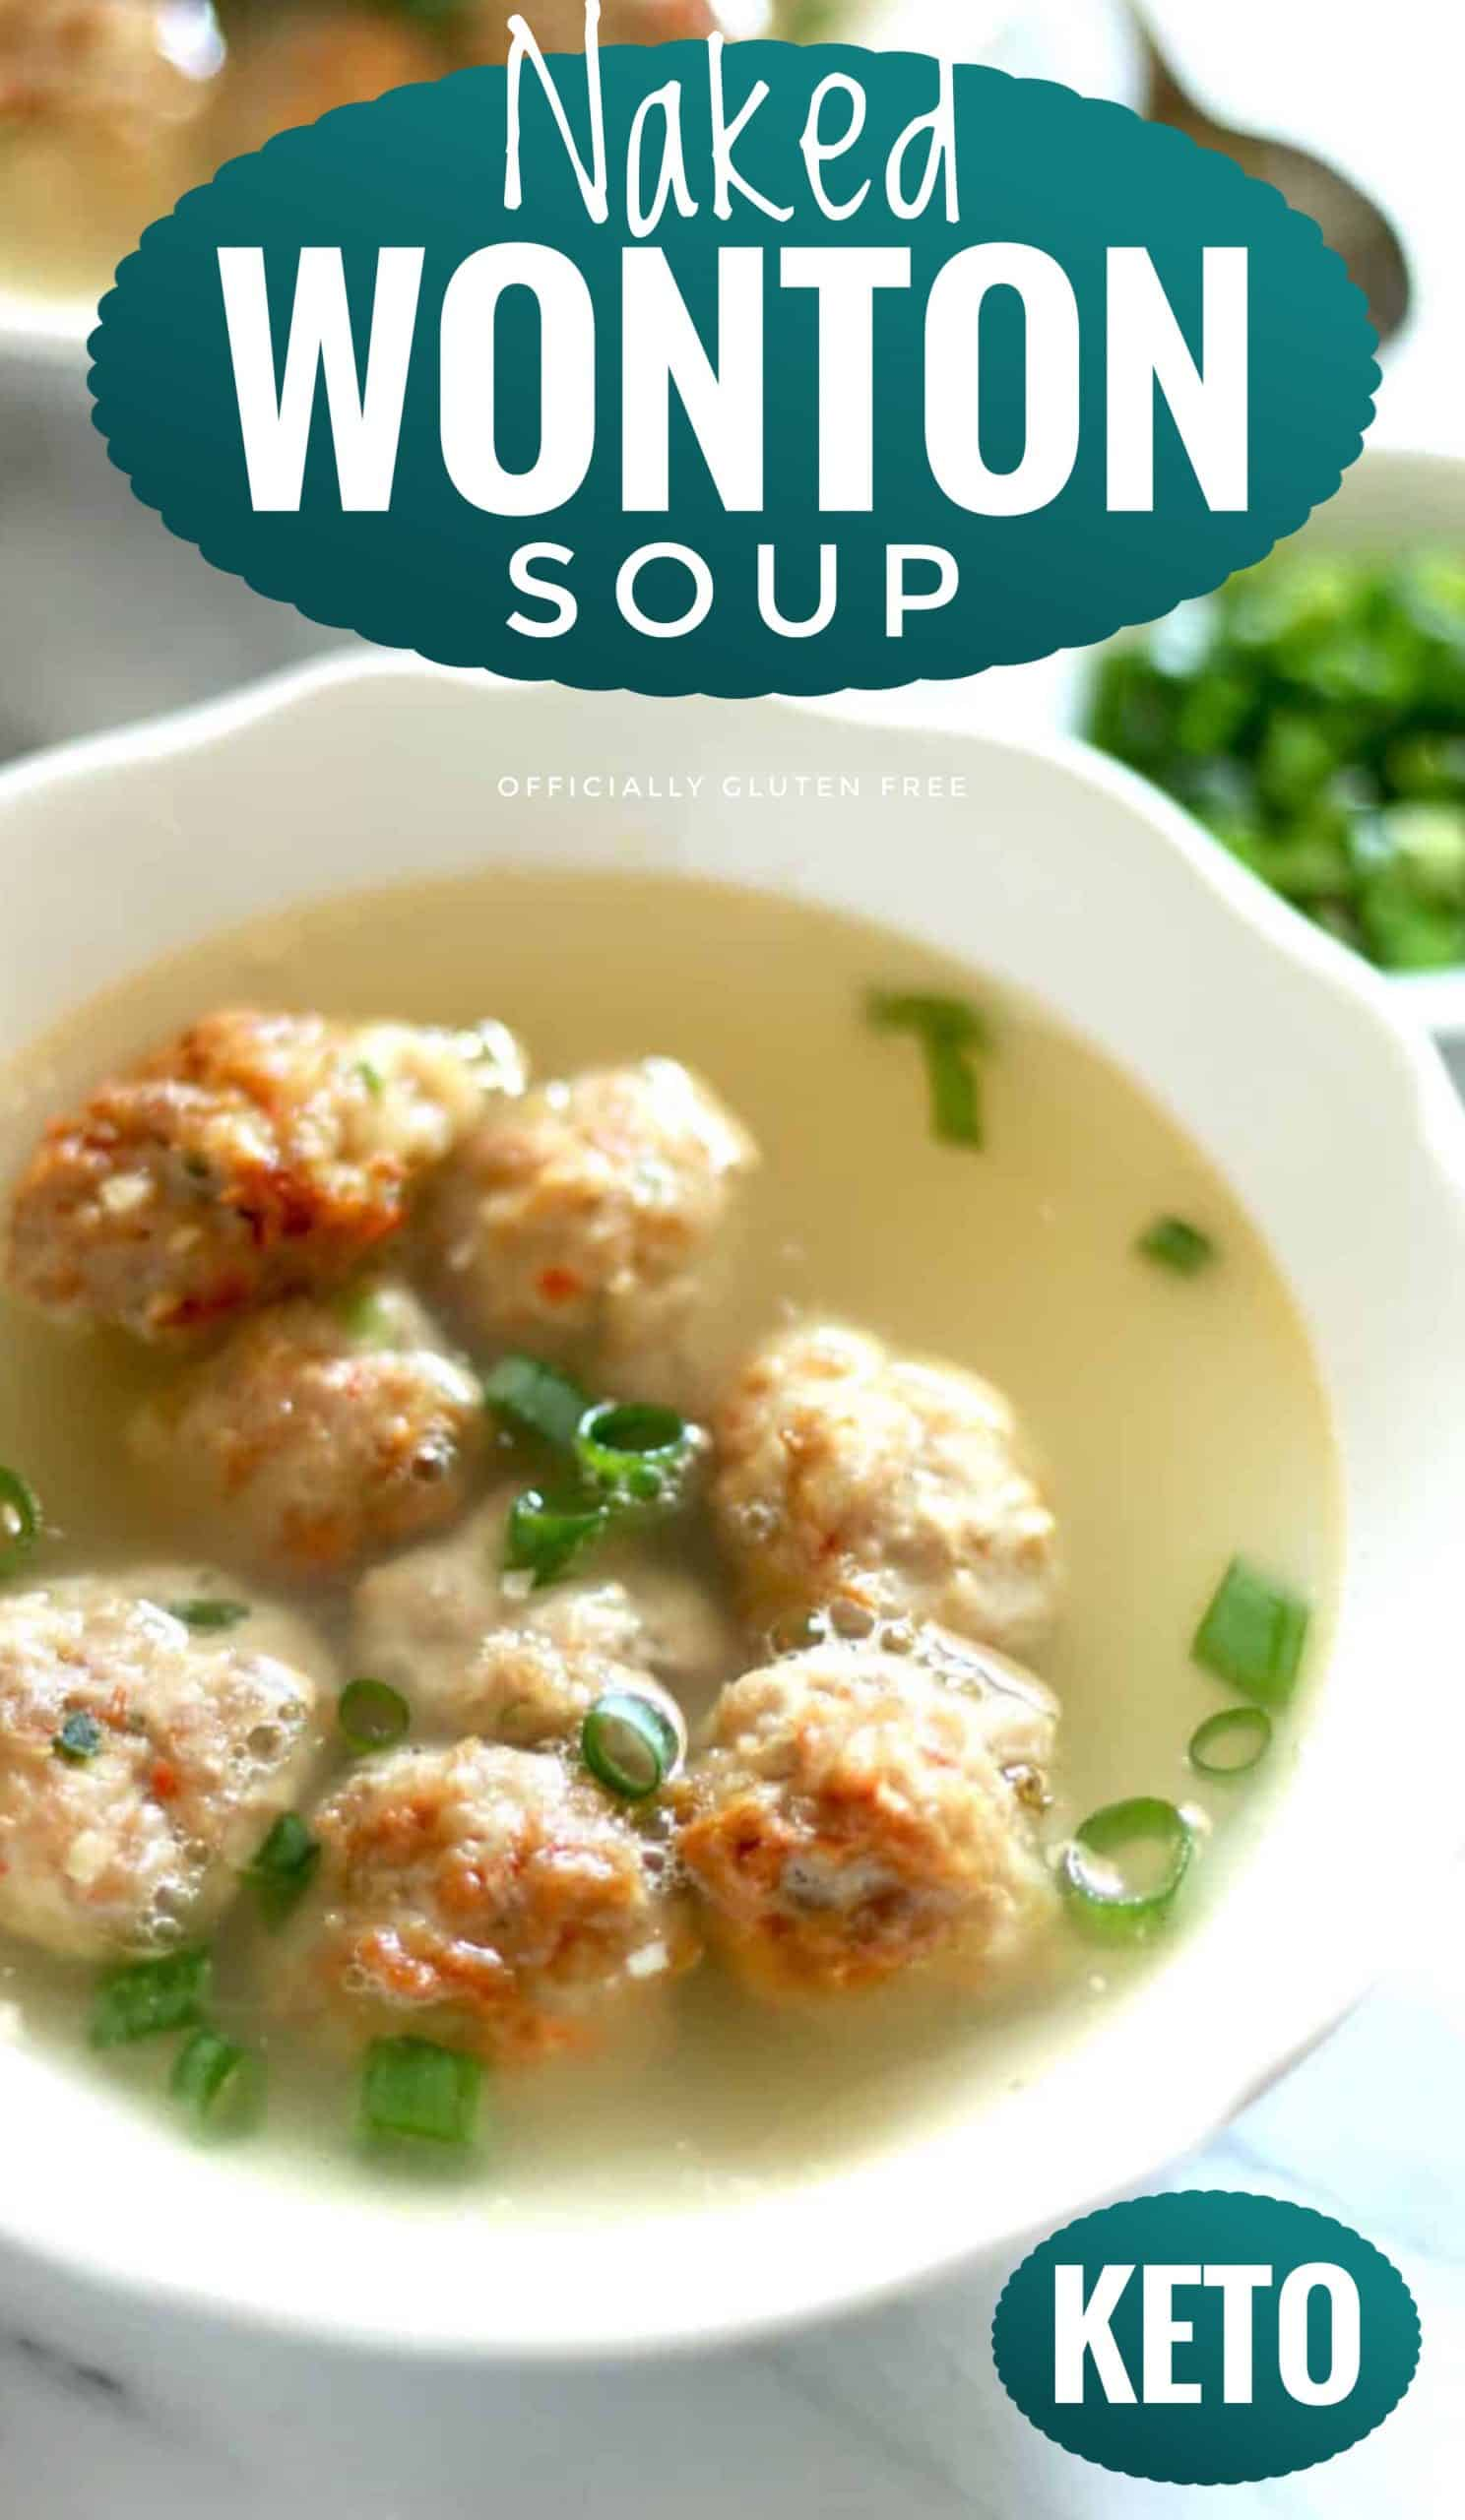 Naked Wonton Soup